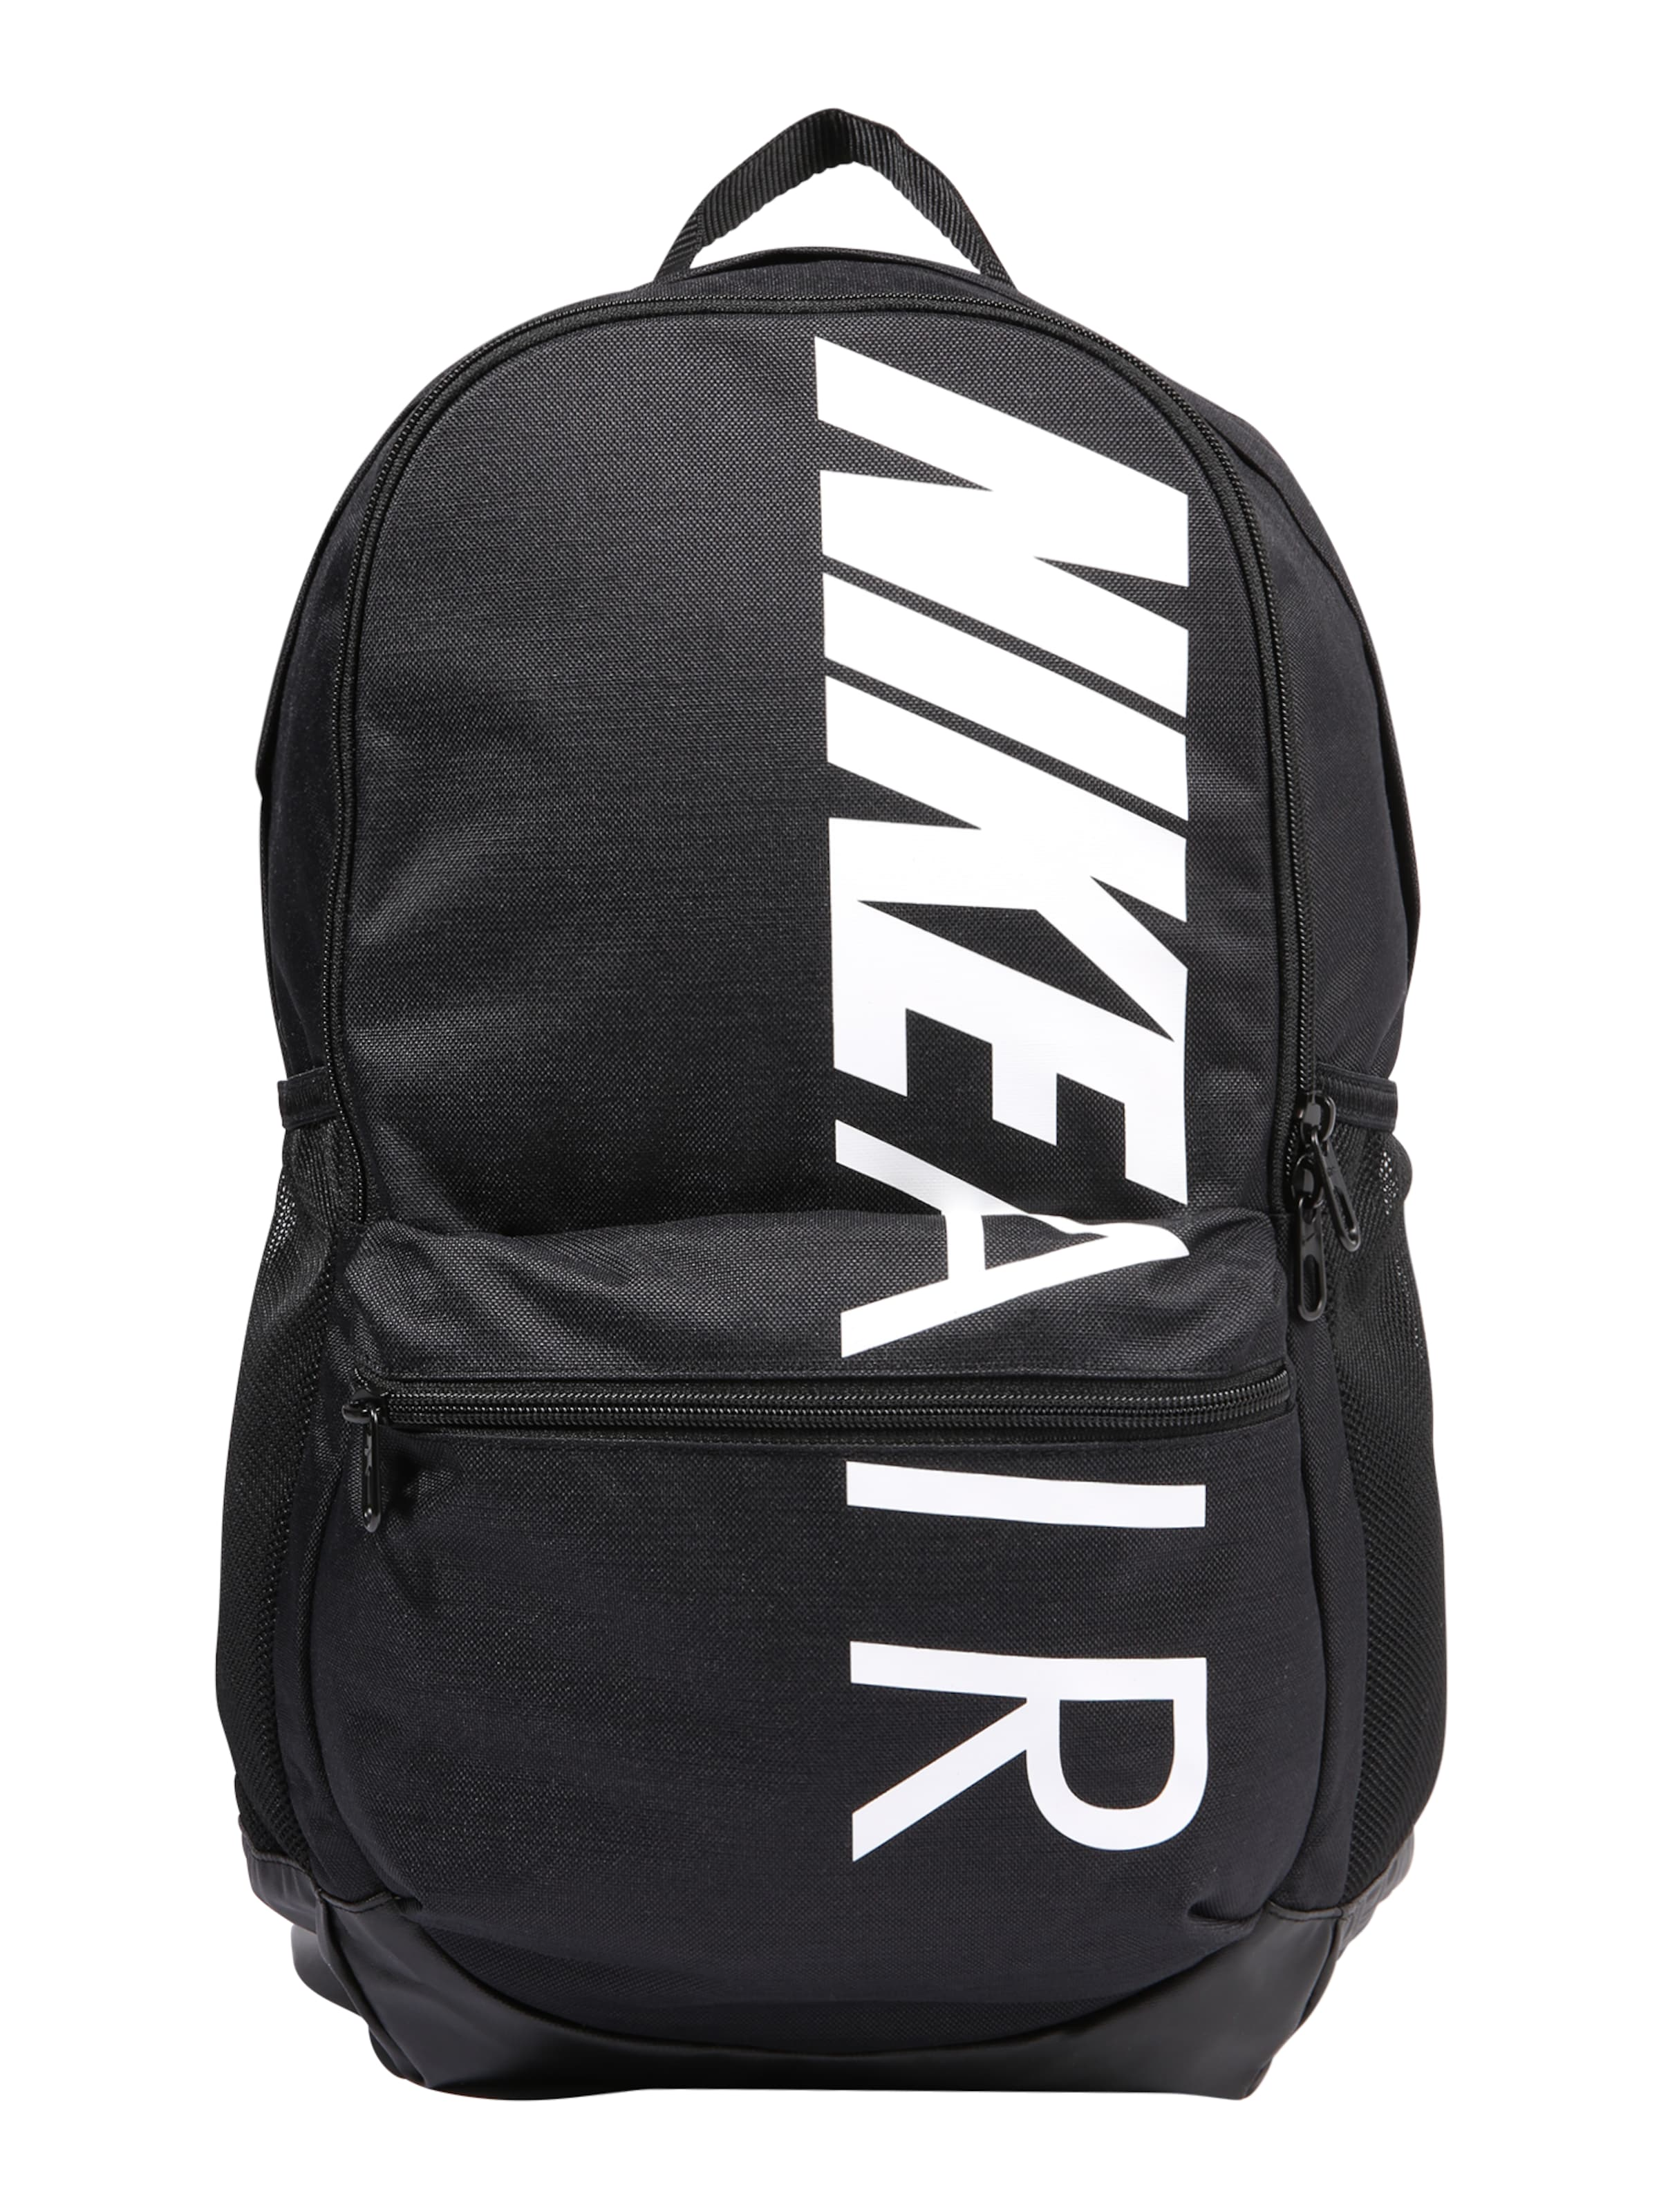 537261c8515d8 Nike   In Brasiliamedium  nike Rucksack SchwarzWeiß nkP8ON0wX